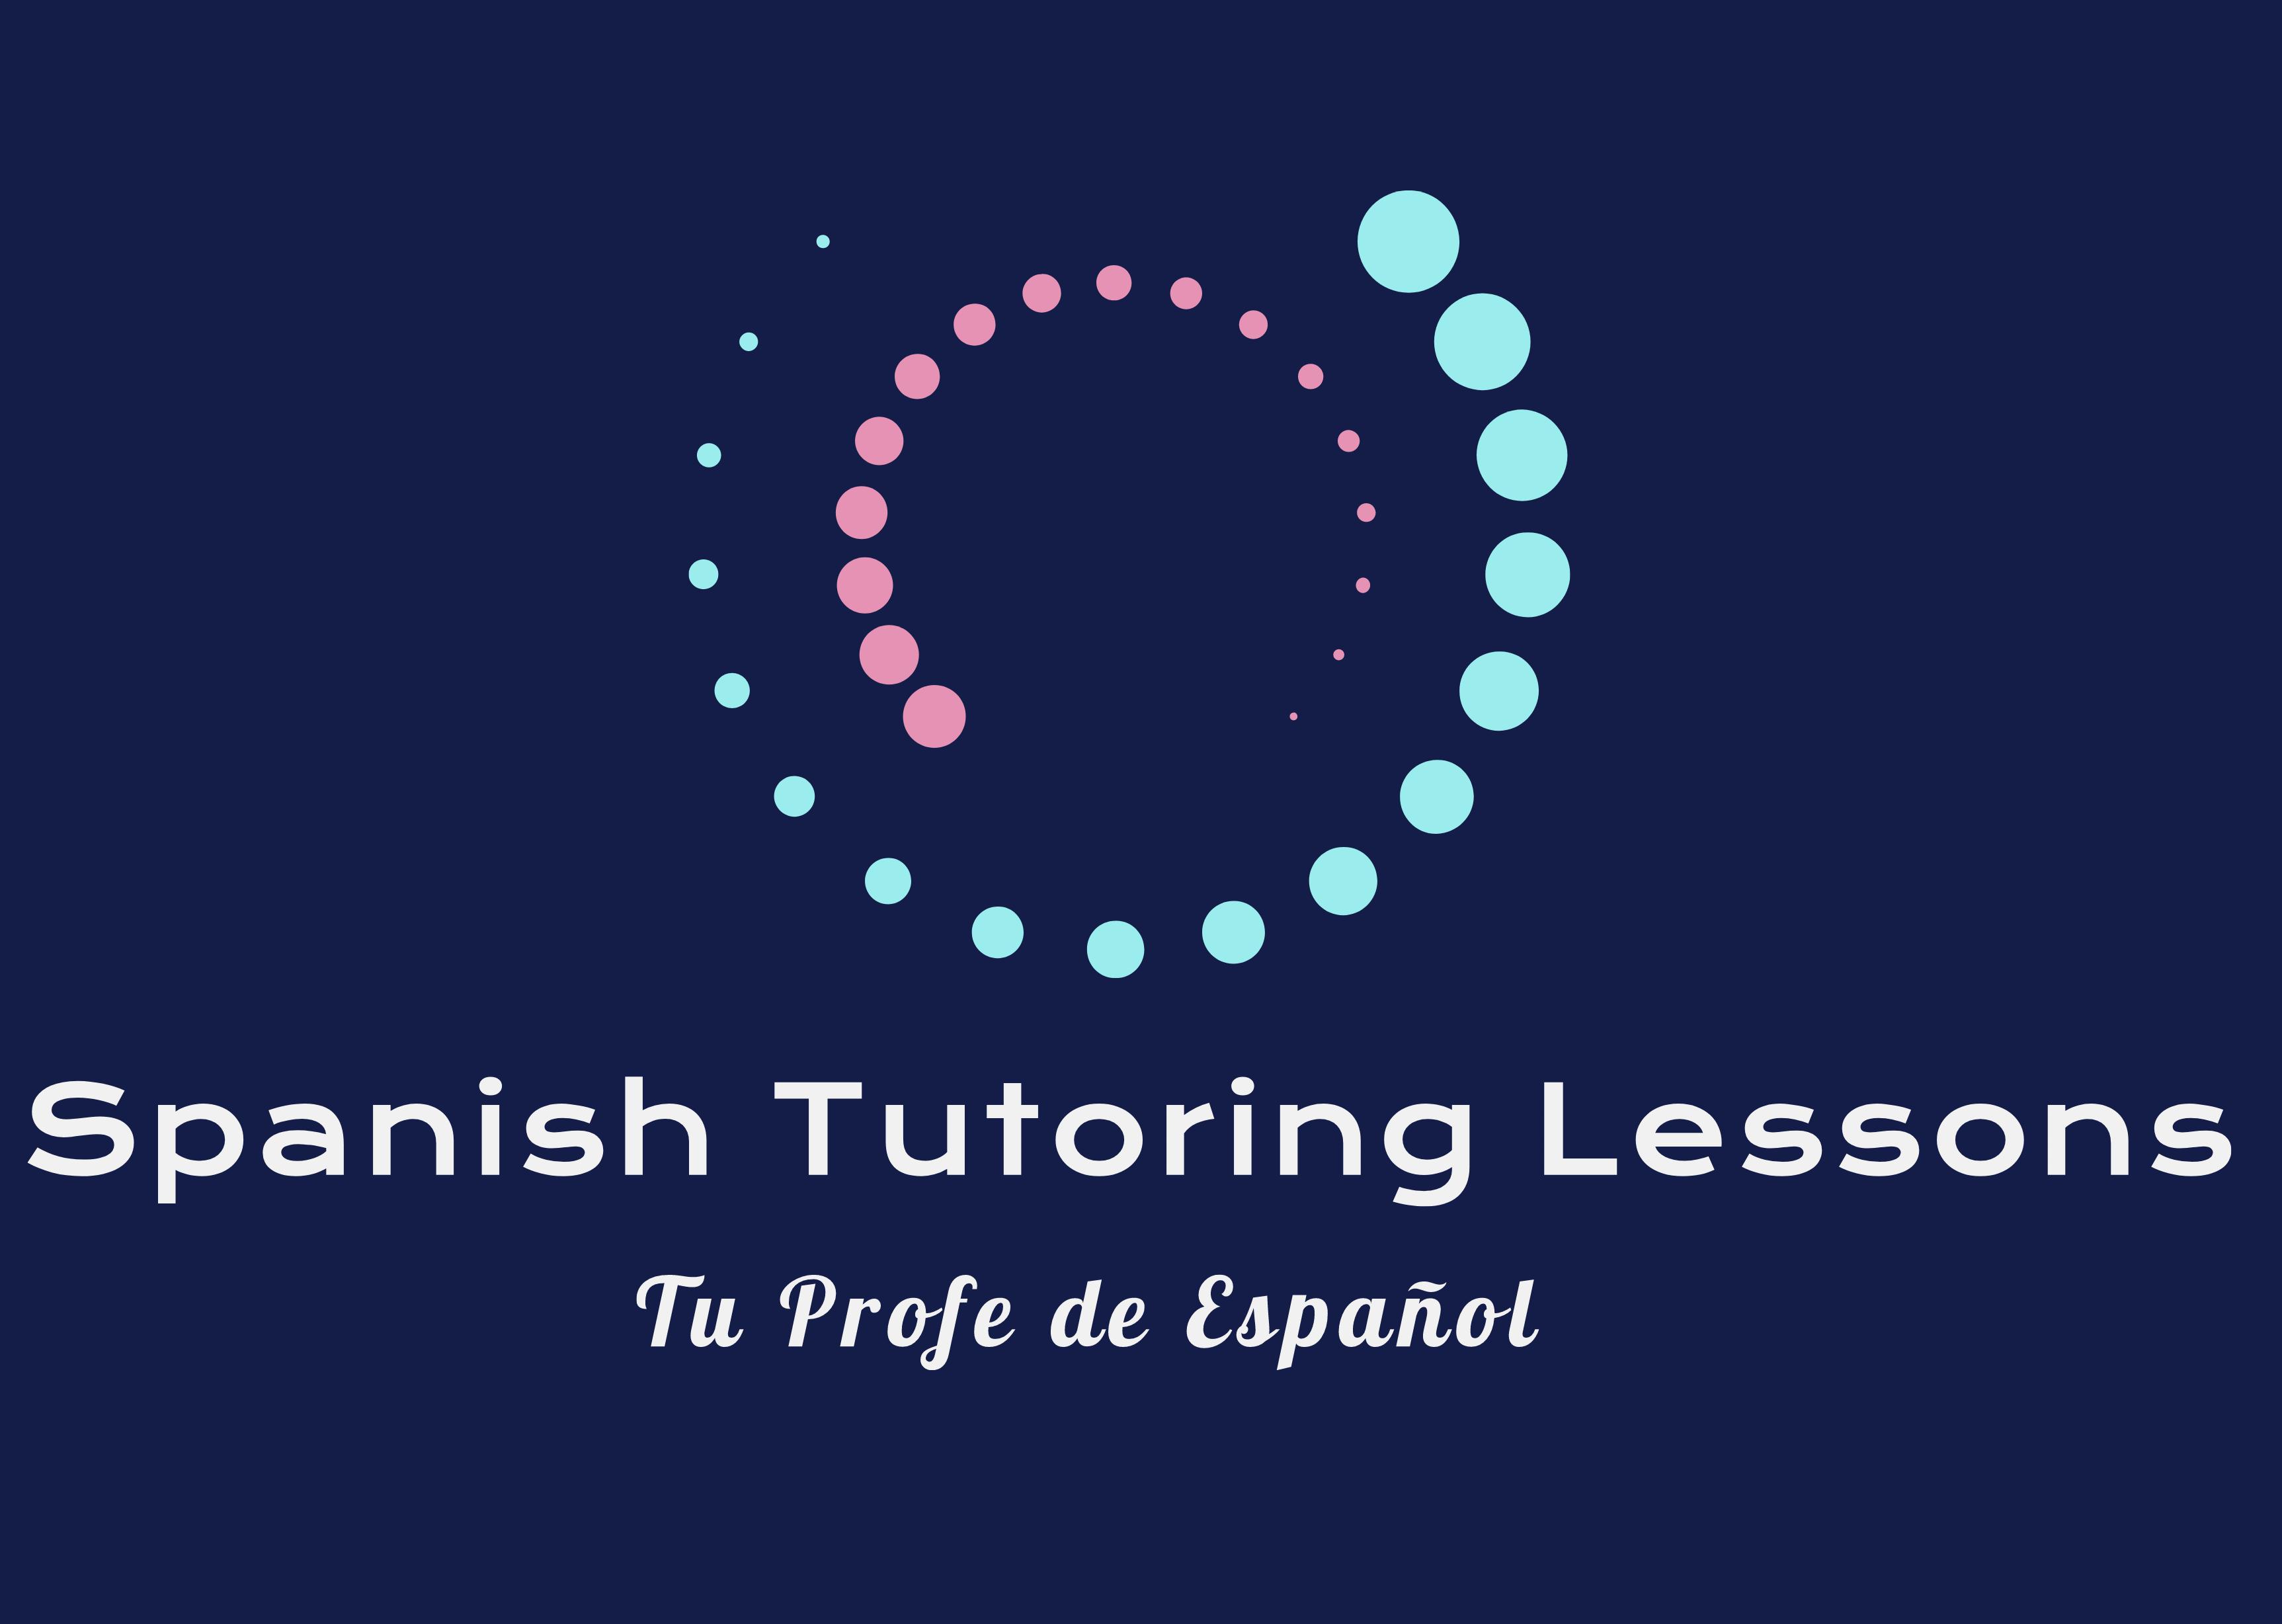 Spanish Tutoring Lessons